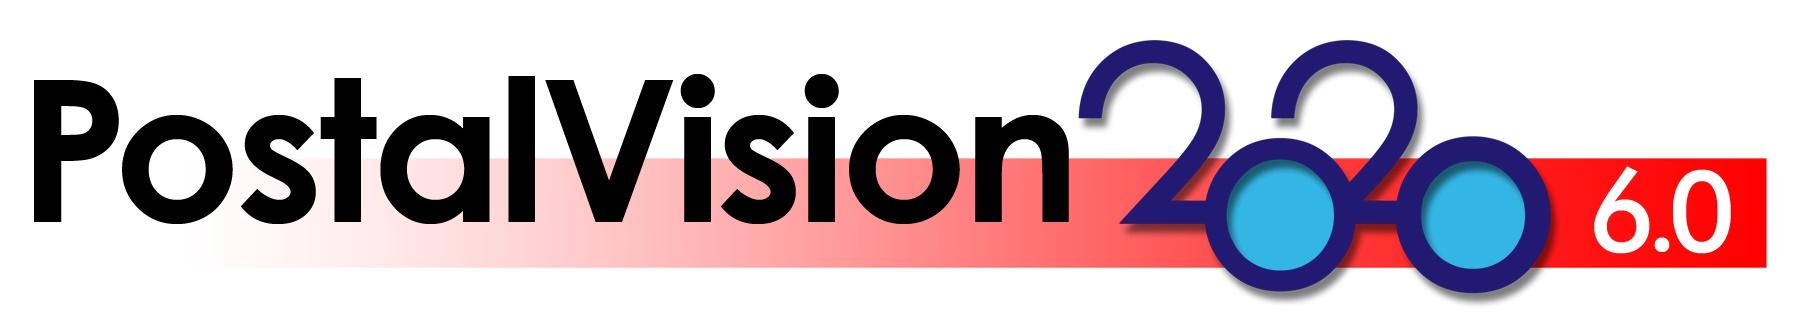 PostalVision2020/6.0